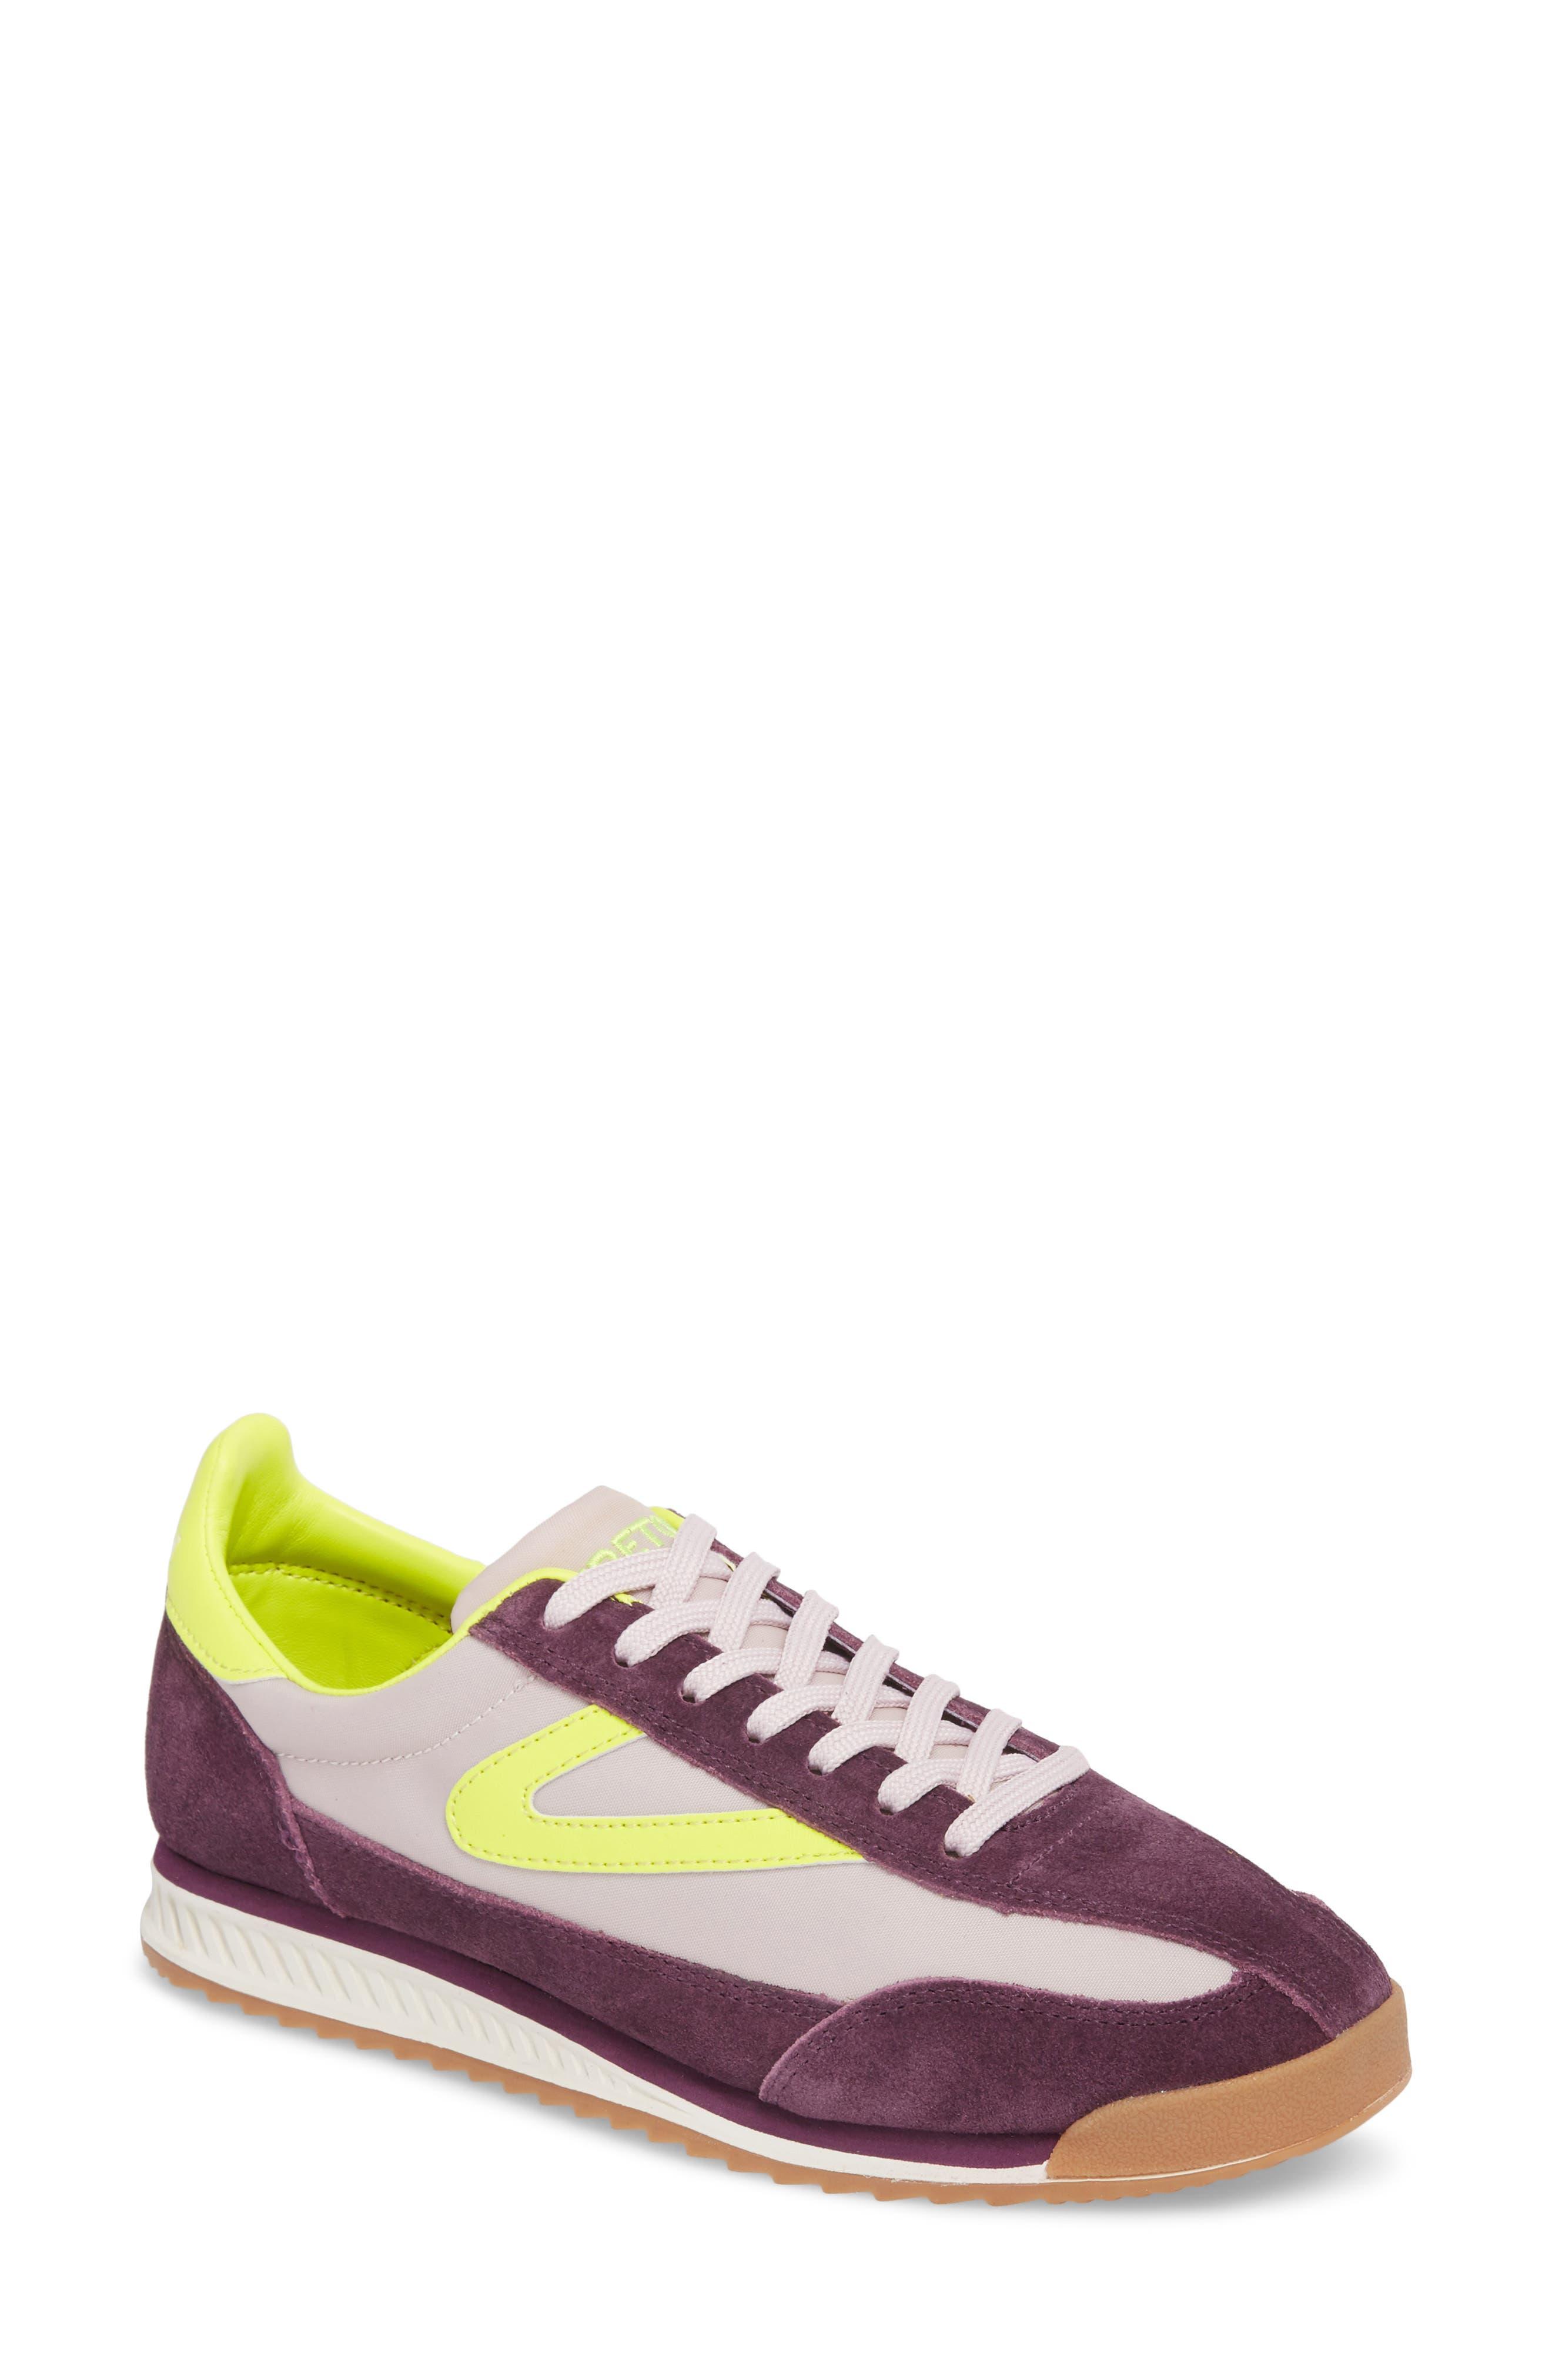 Rawlins 2 Sneaker,                             Main thumbnail 1, color,                             Eggplant/ Summer Lilac/ Yellow